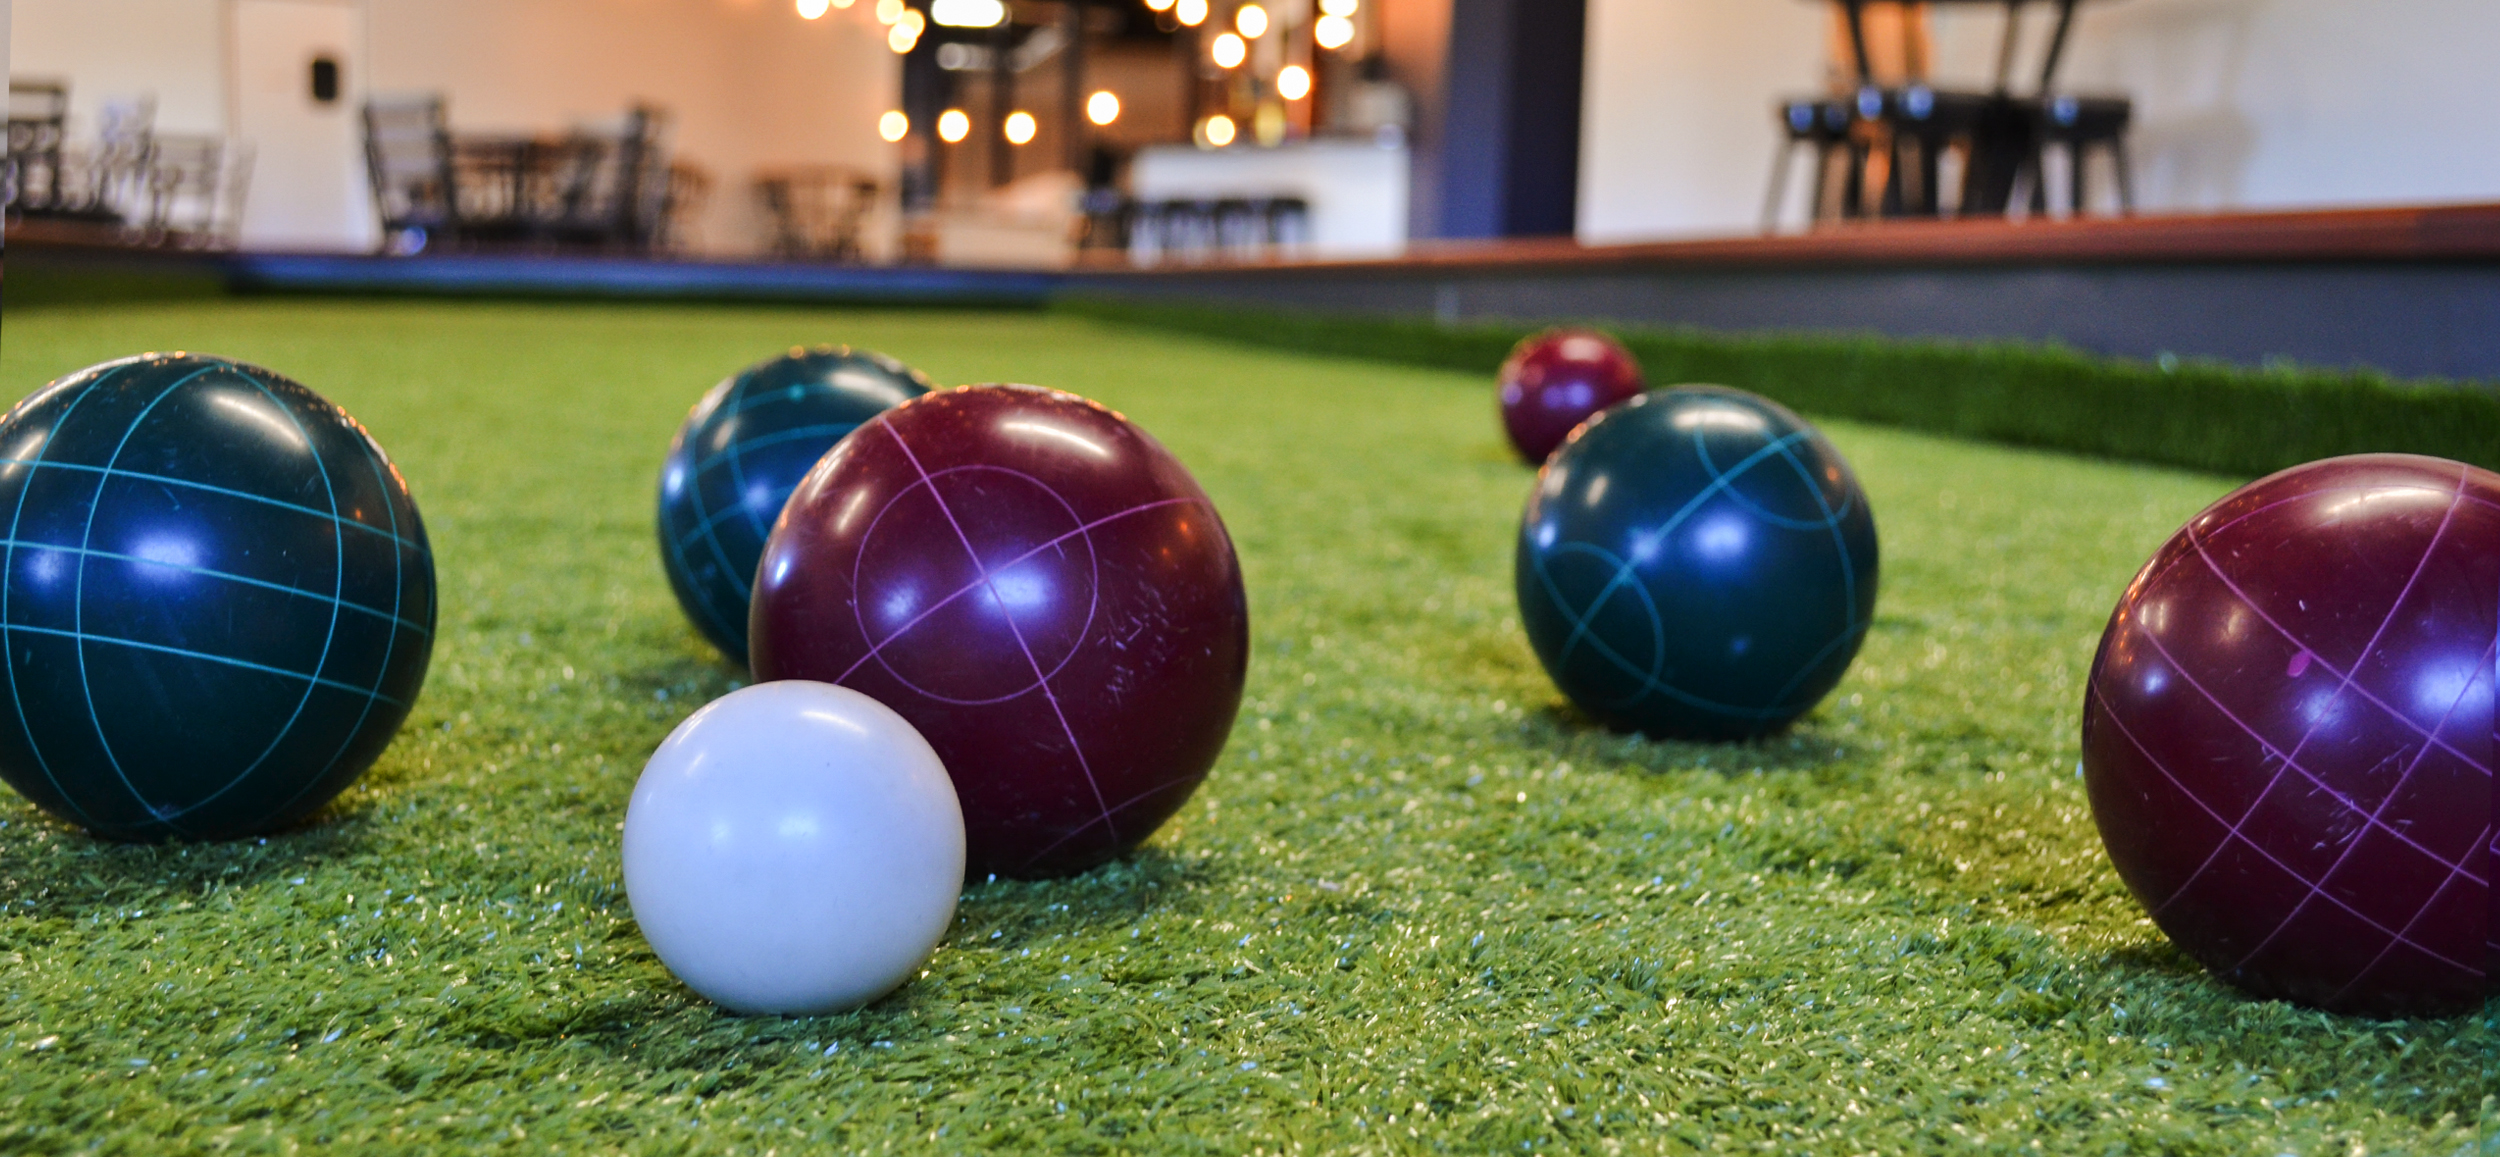 Bowling, Billiards, Darts, Bocce & More